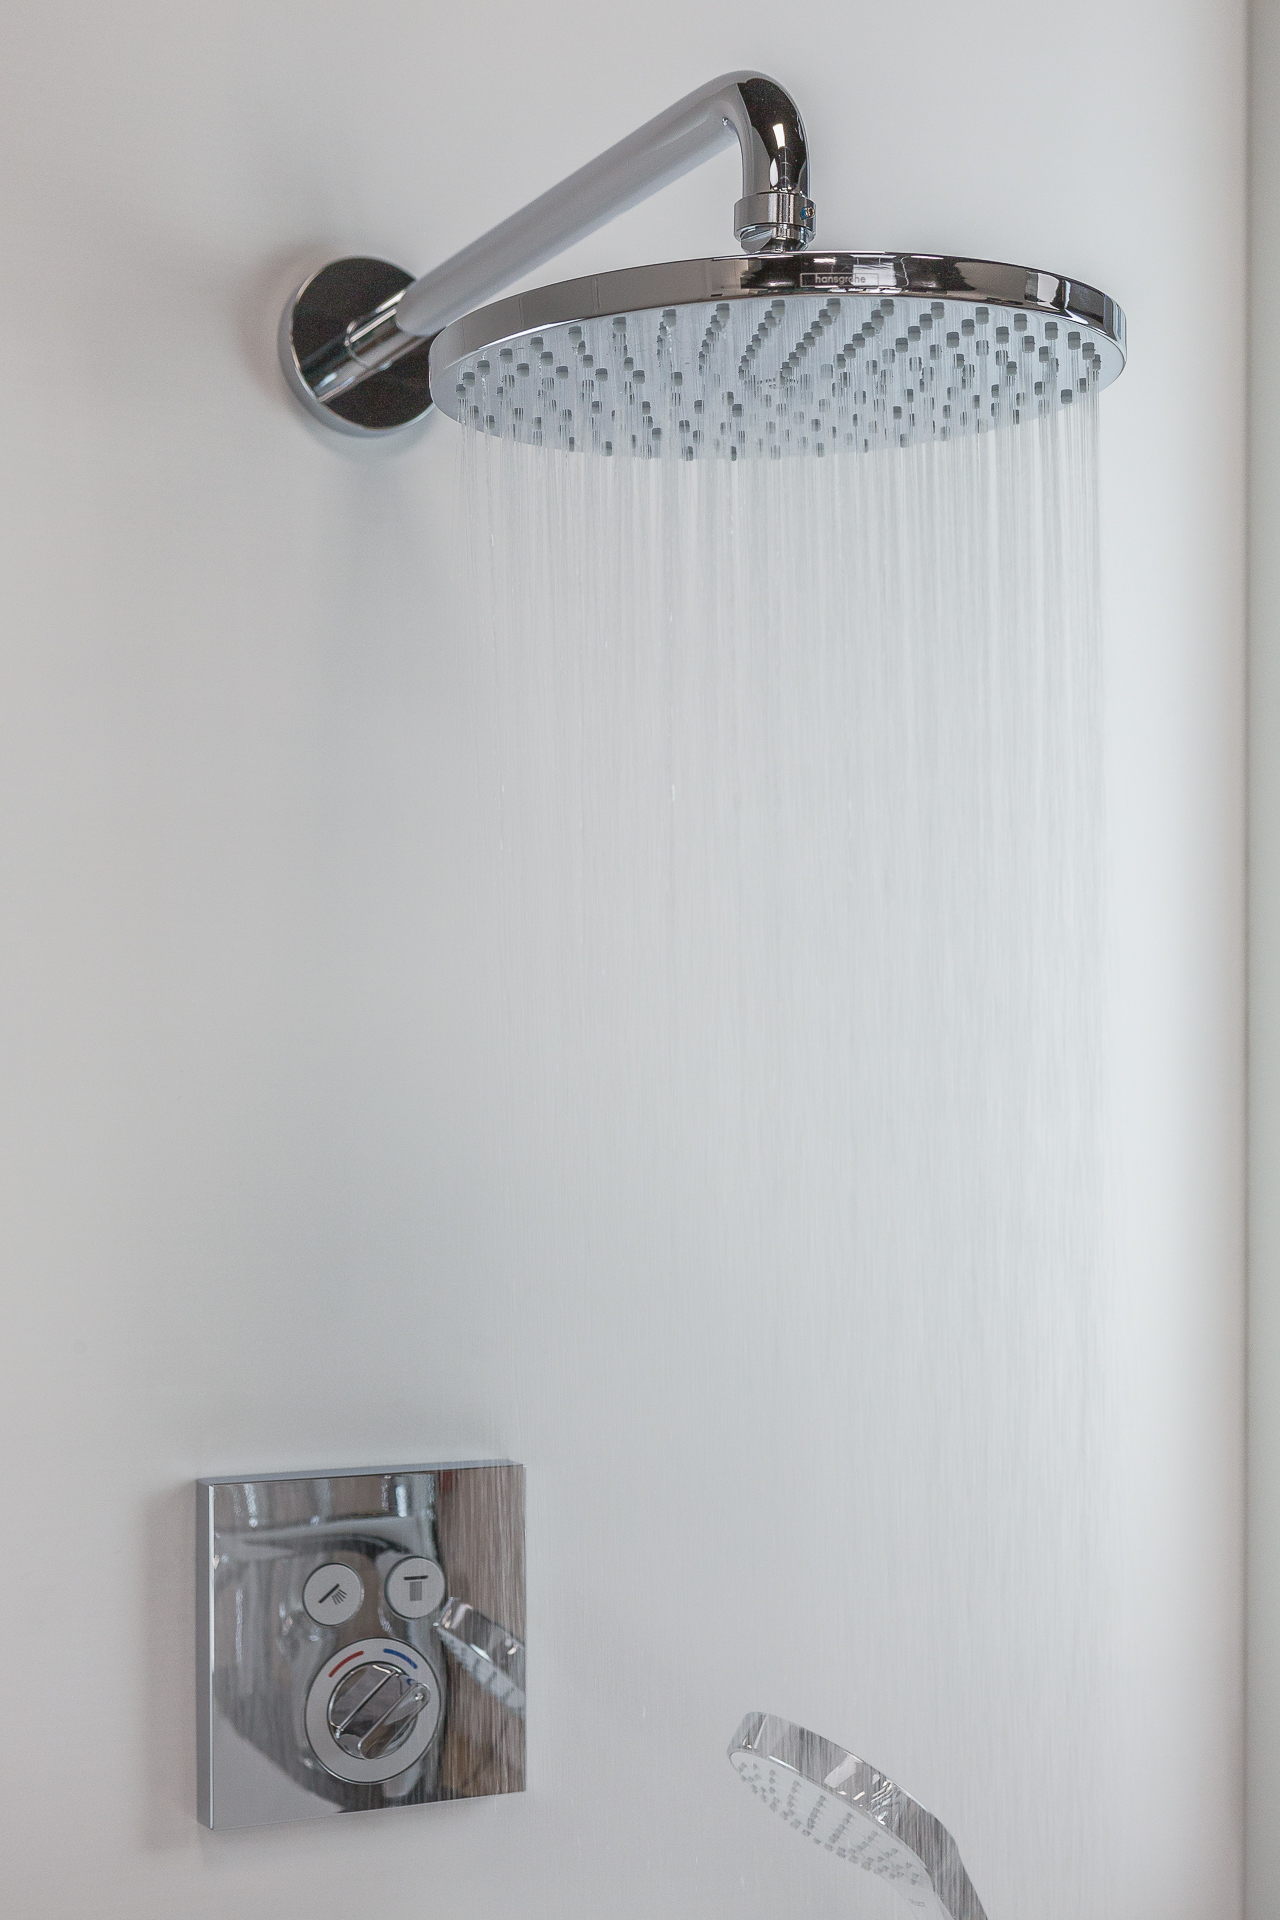 douche ronde